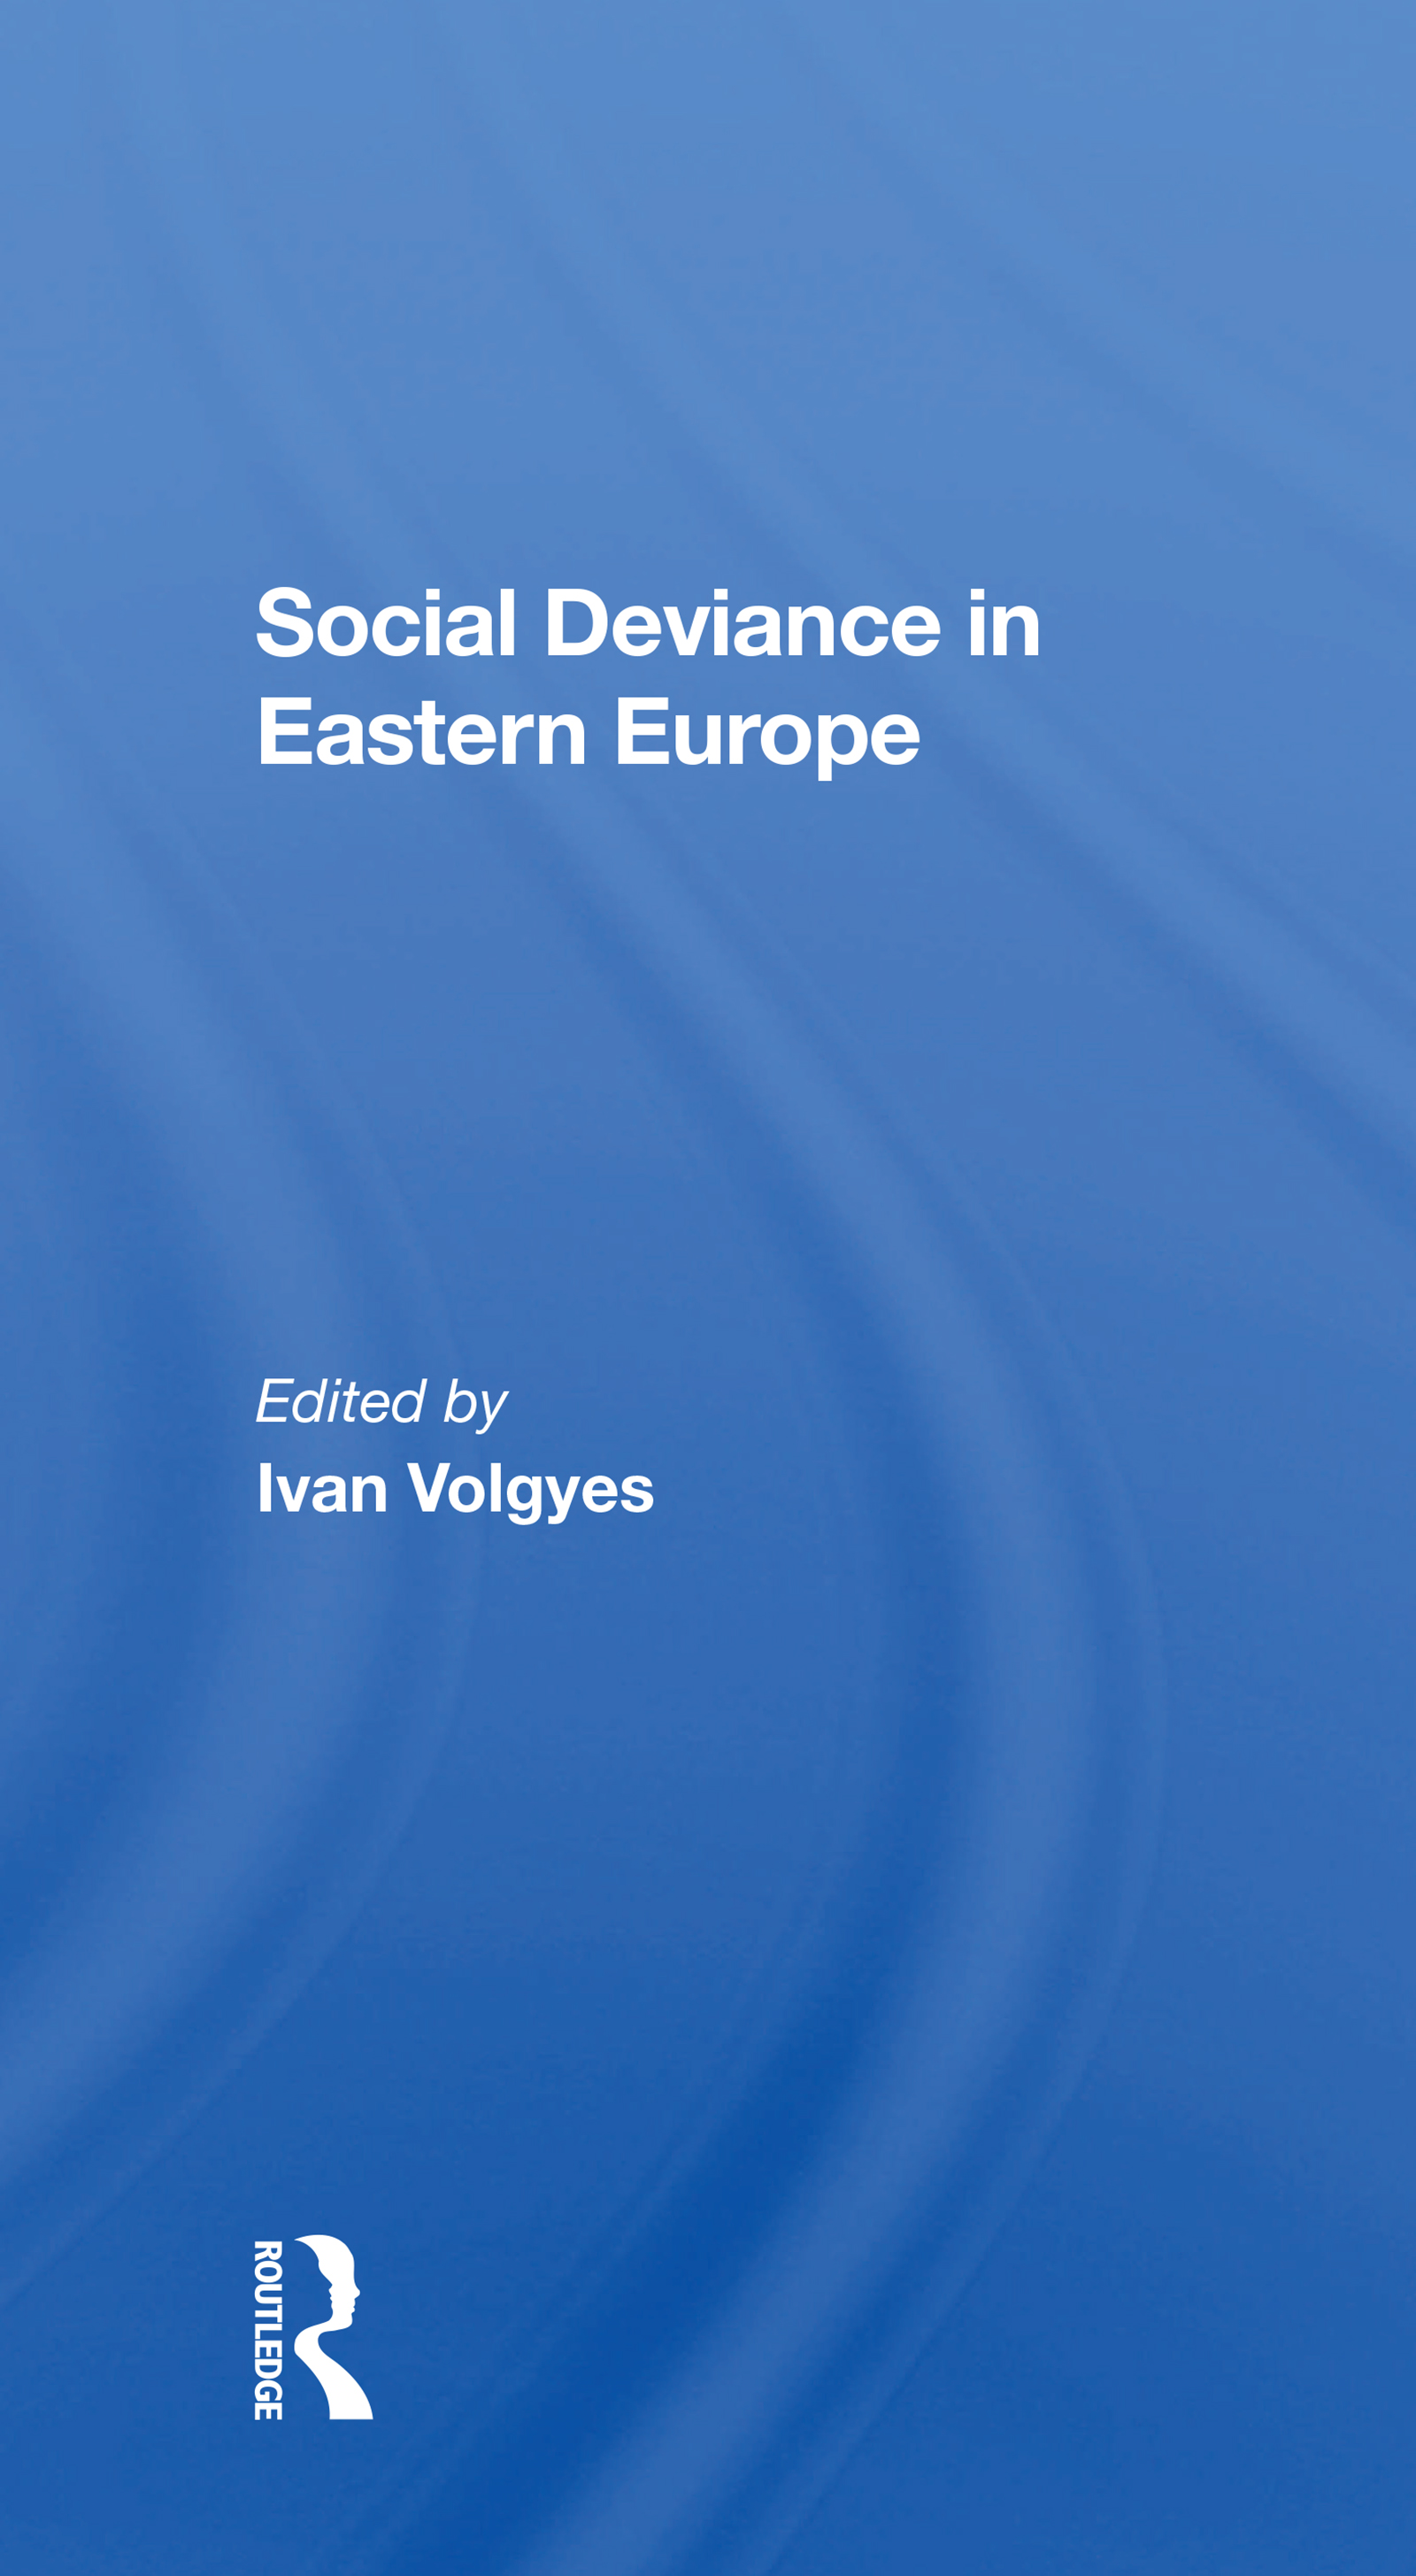 Social Deviance in Eastern Europe